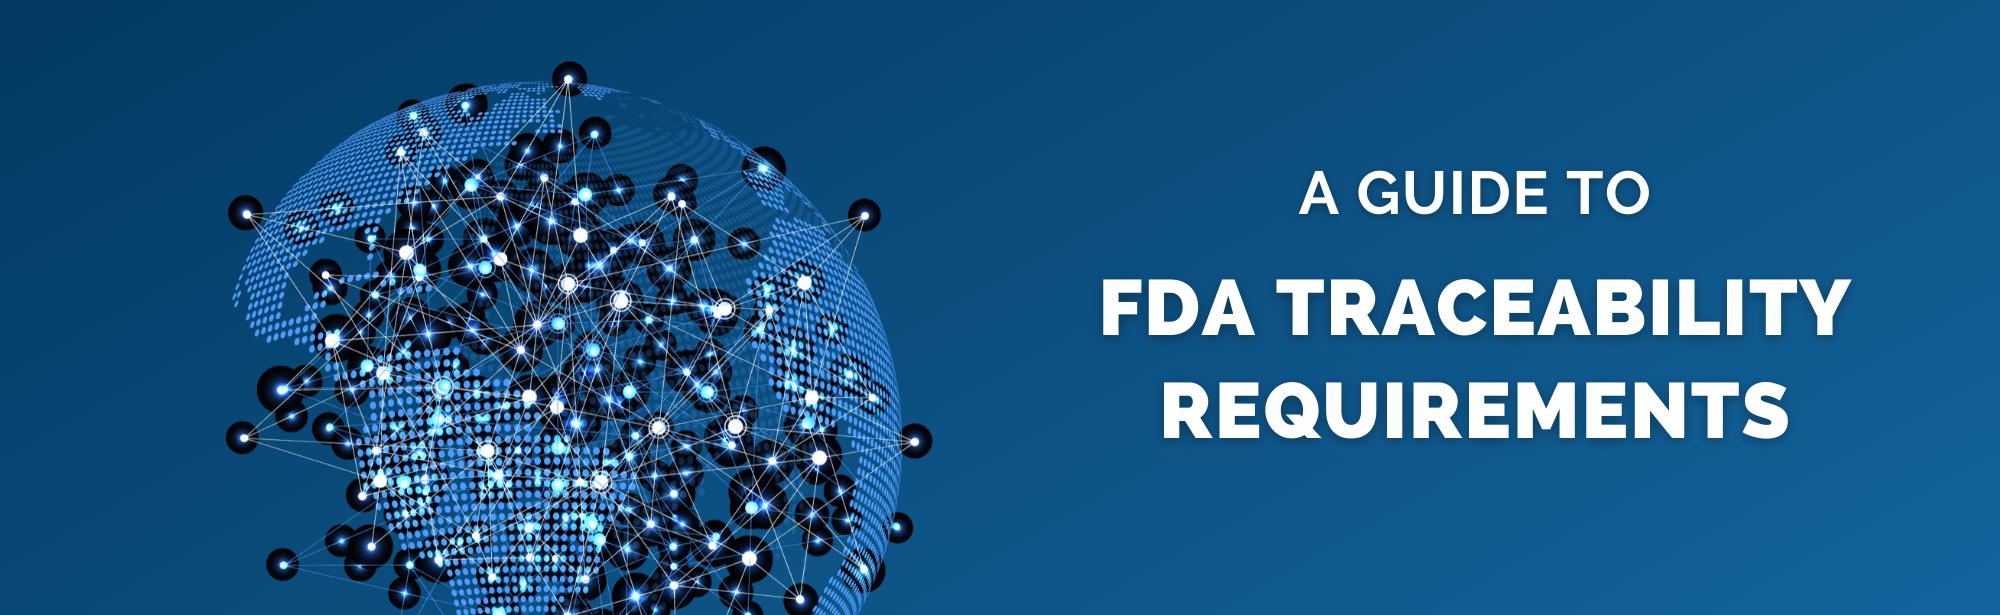 FDA Traceability Requirements